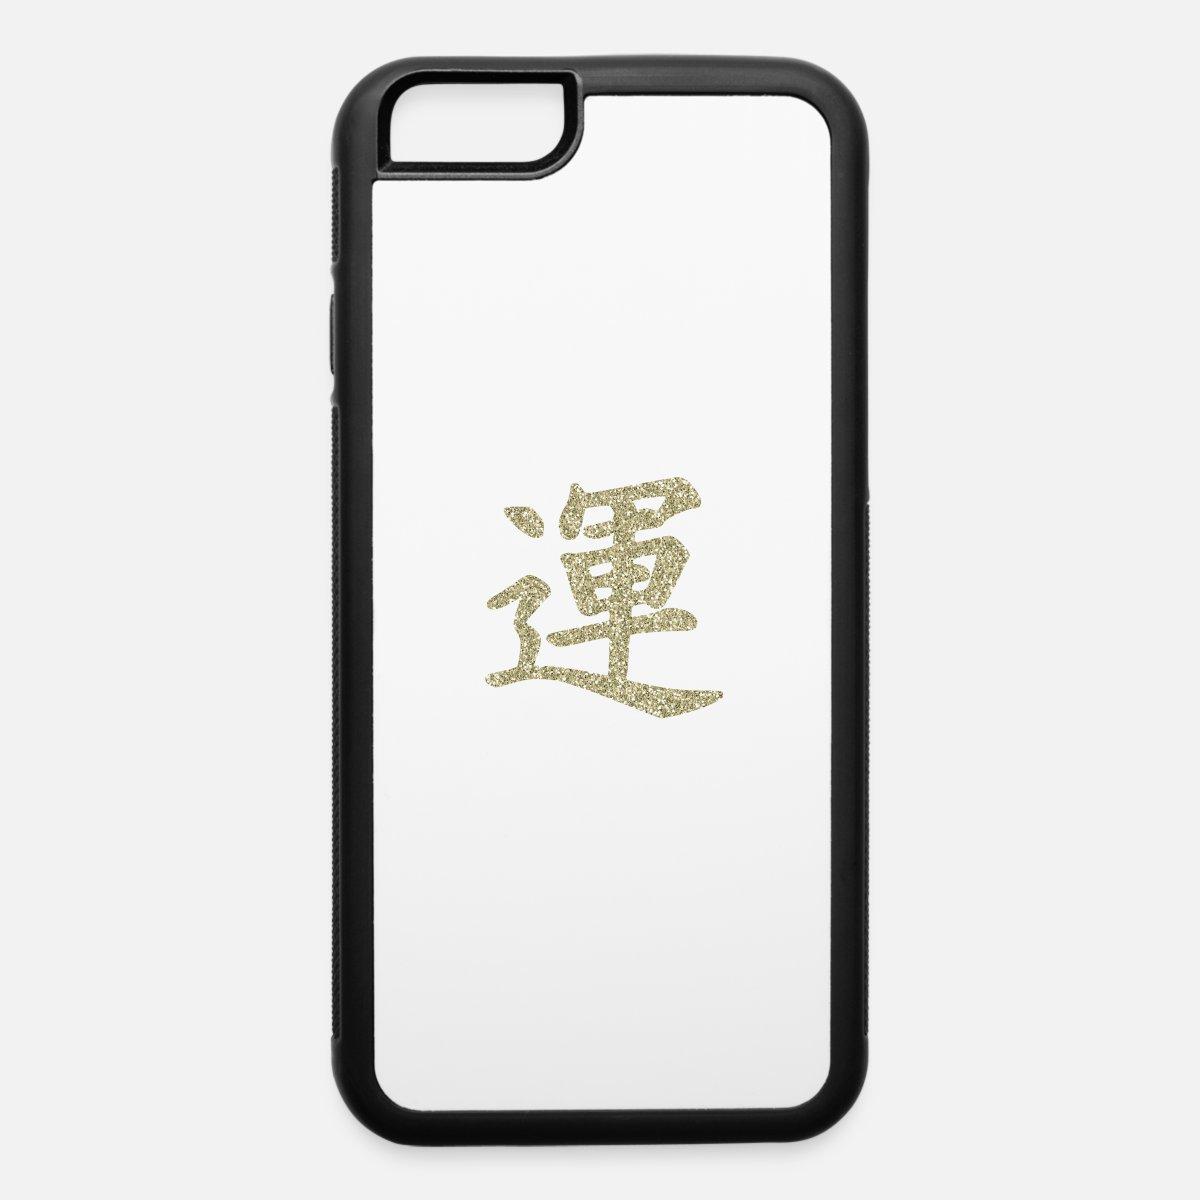 Japanese Monogram Iphone 7 8 Case Spreadshirt